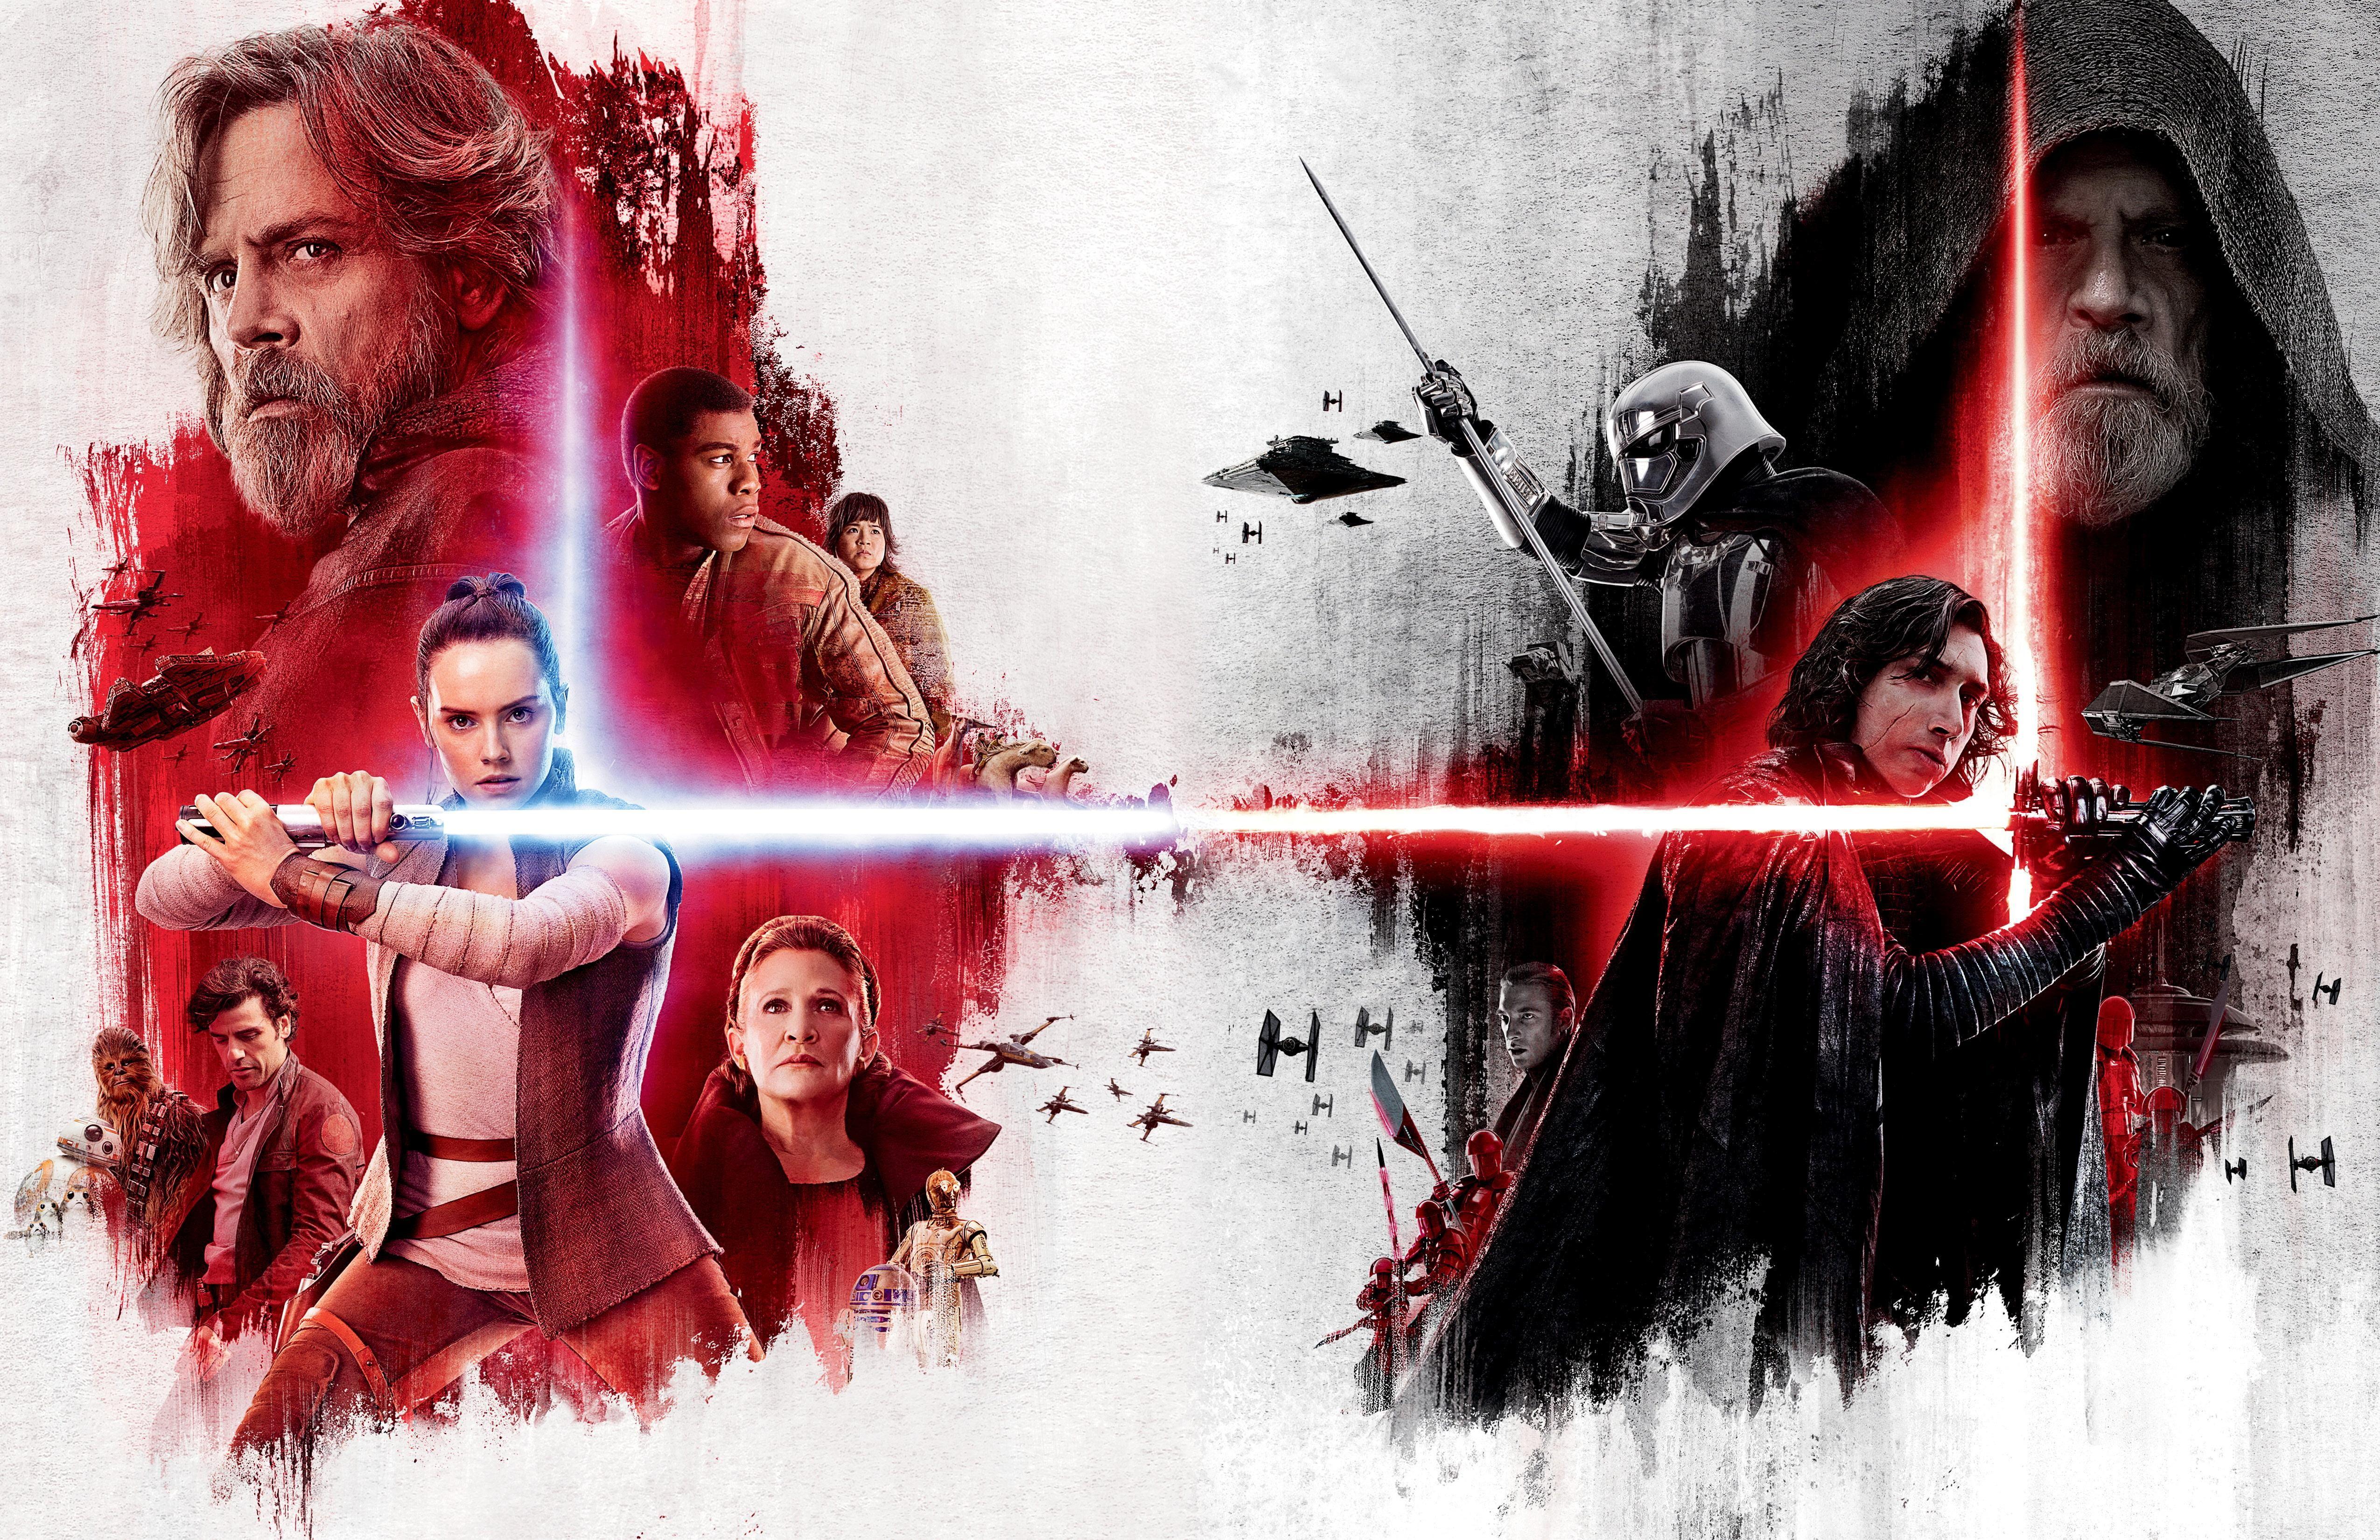 Rey Star Wars Wallpaper 39 Images Star Wars Wallpaper Star Wars Illustration Rey Star Wars